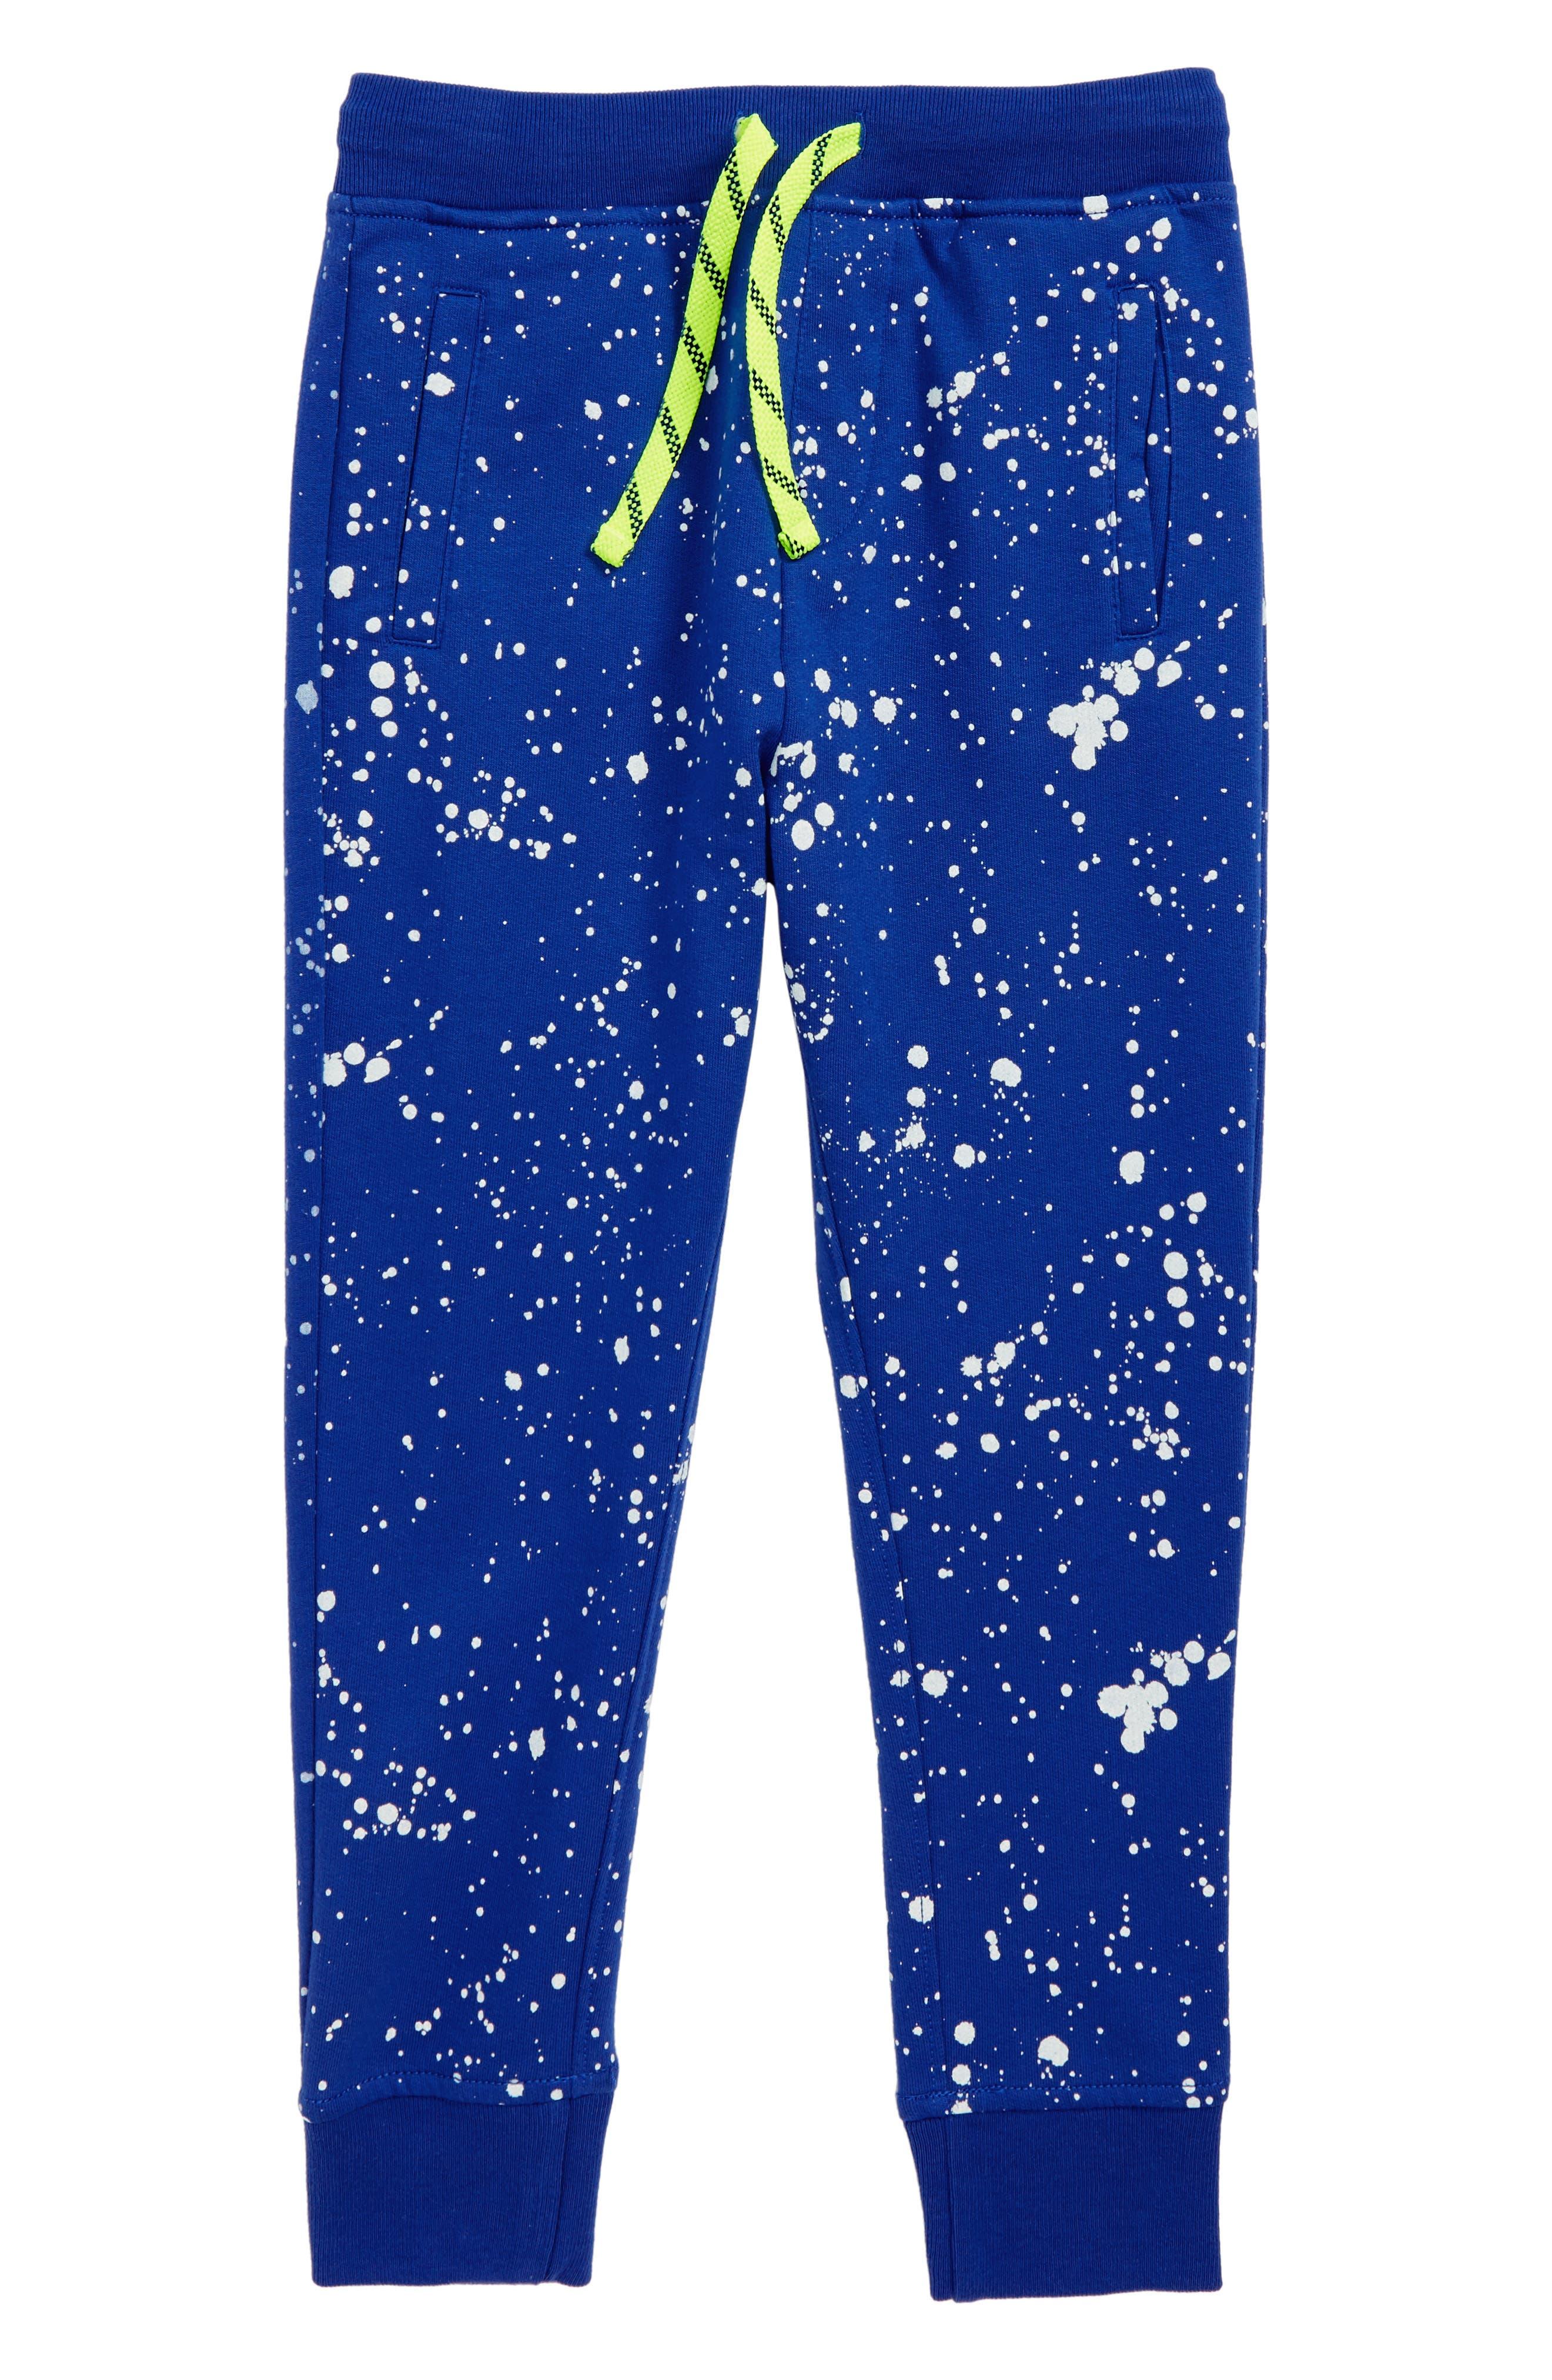 Toddler Boys Crewcuts By Jcrew Splatter Paint Sweatpants Size 3T  Blue